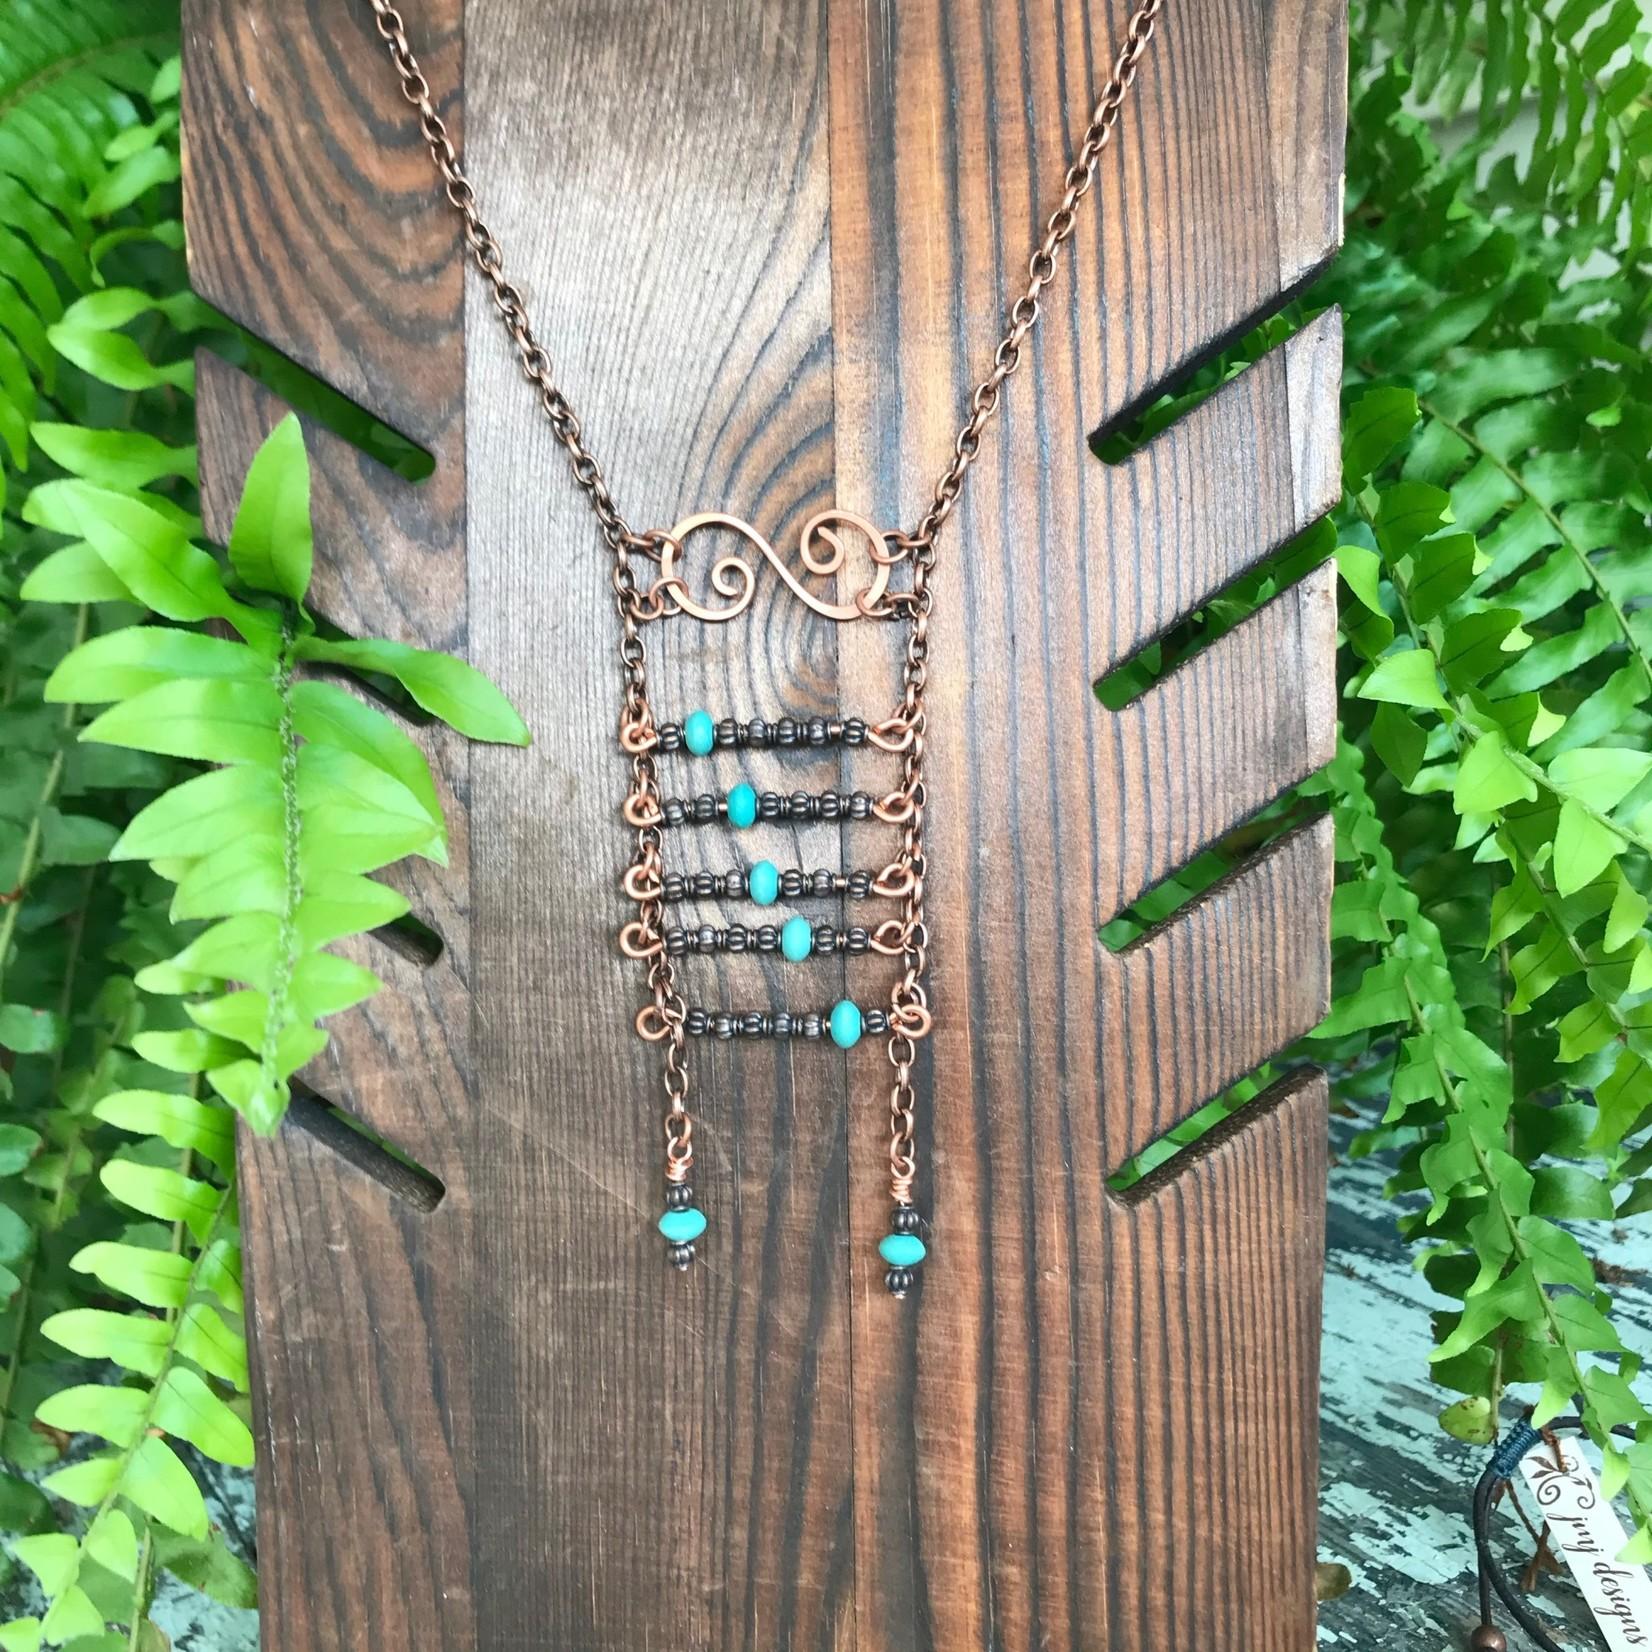 Julia Jones JMJ Designs Deep Roots Coll. Necklace - Copper/Turq Ladder Large 720-12